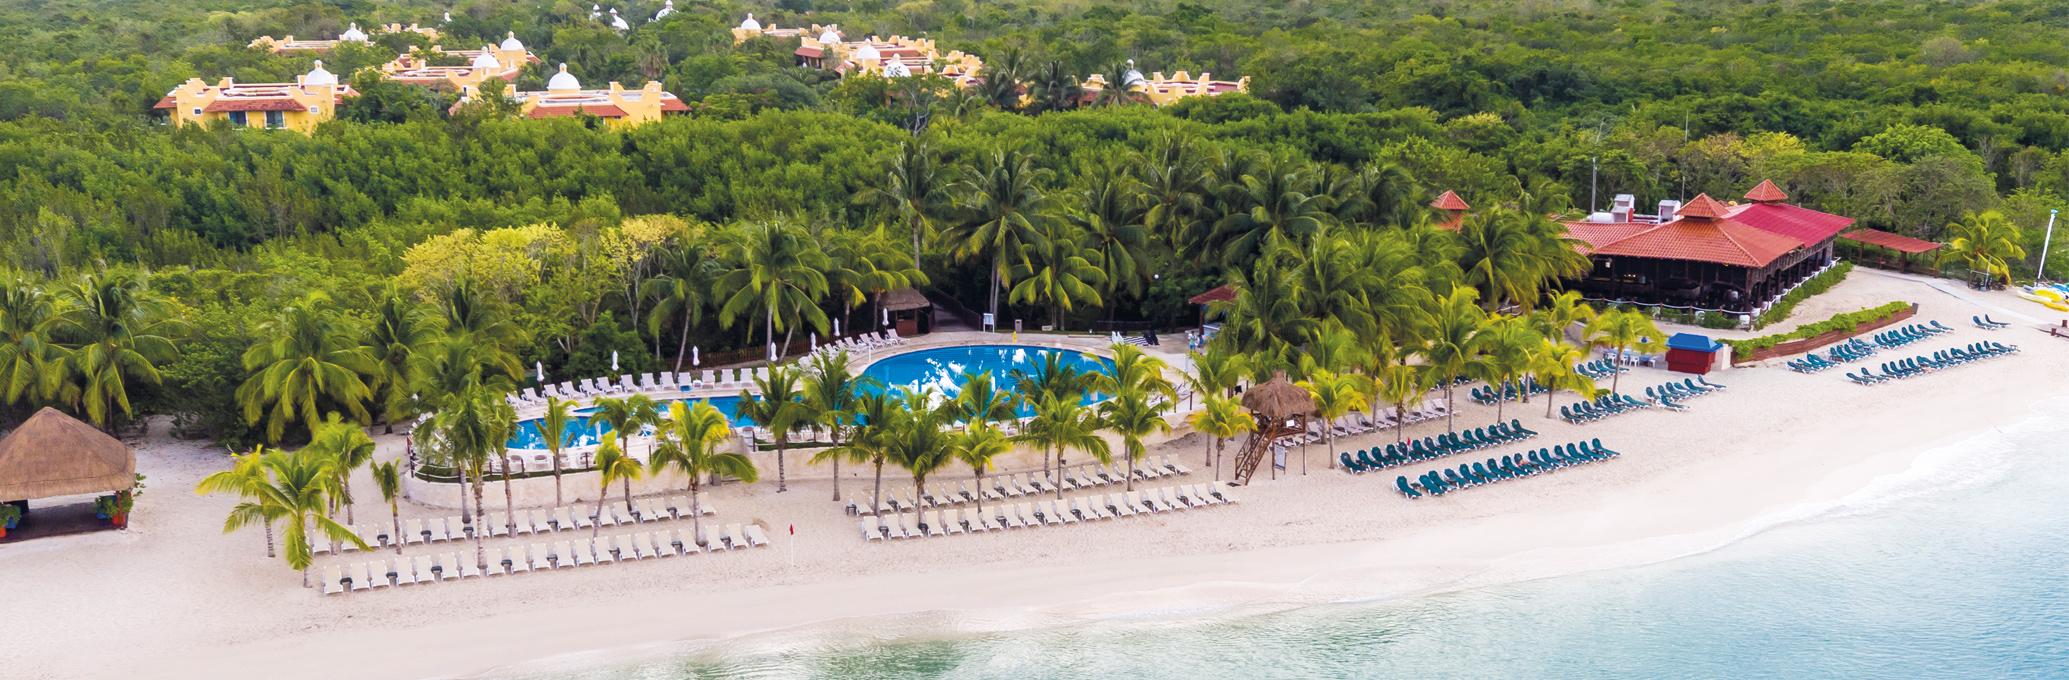 Occidental Cozumel: hotéis em Cozumel